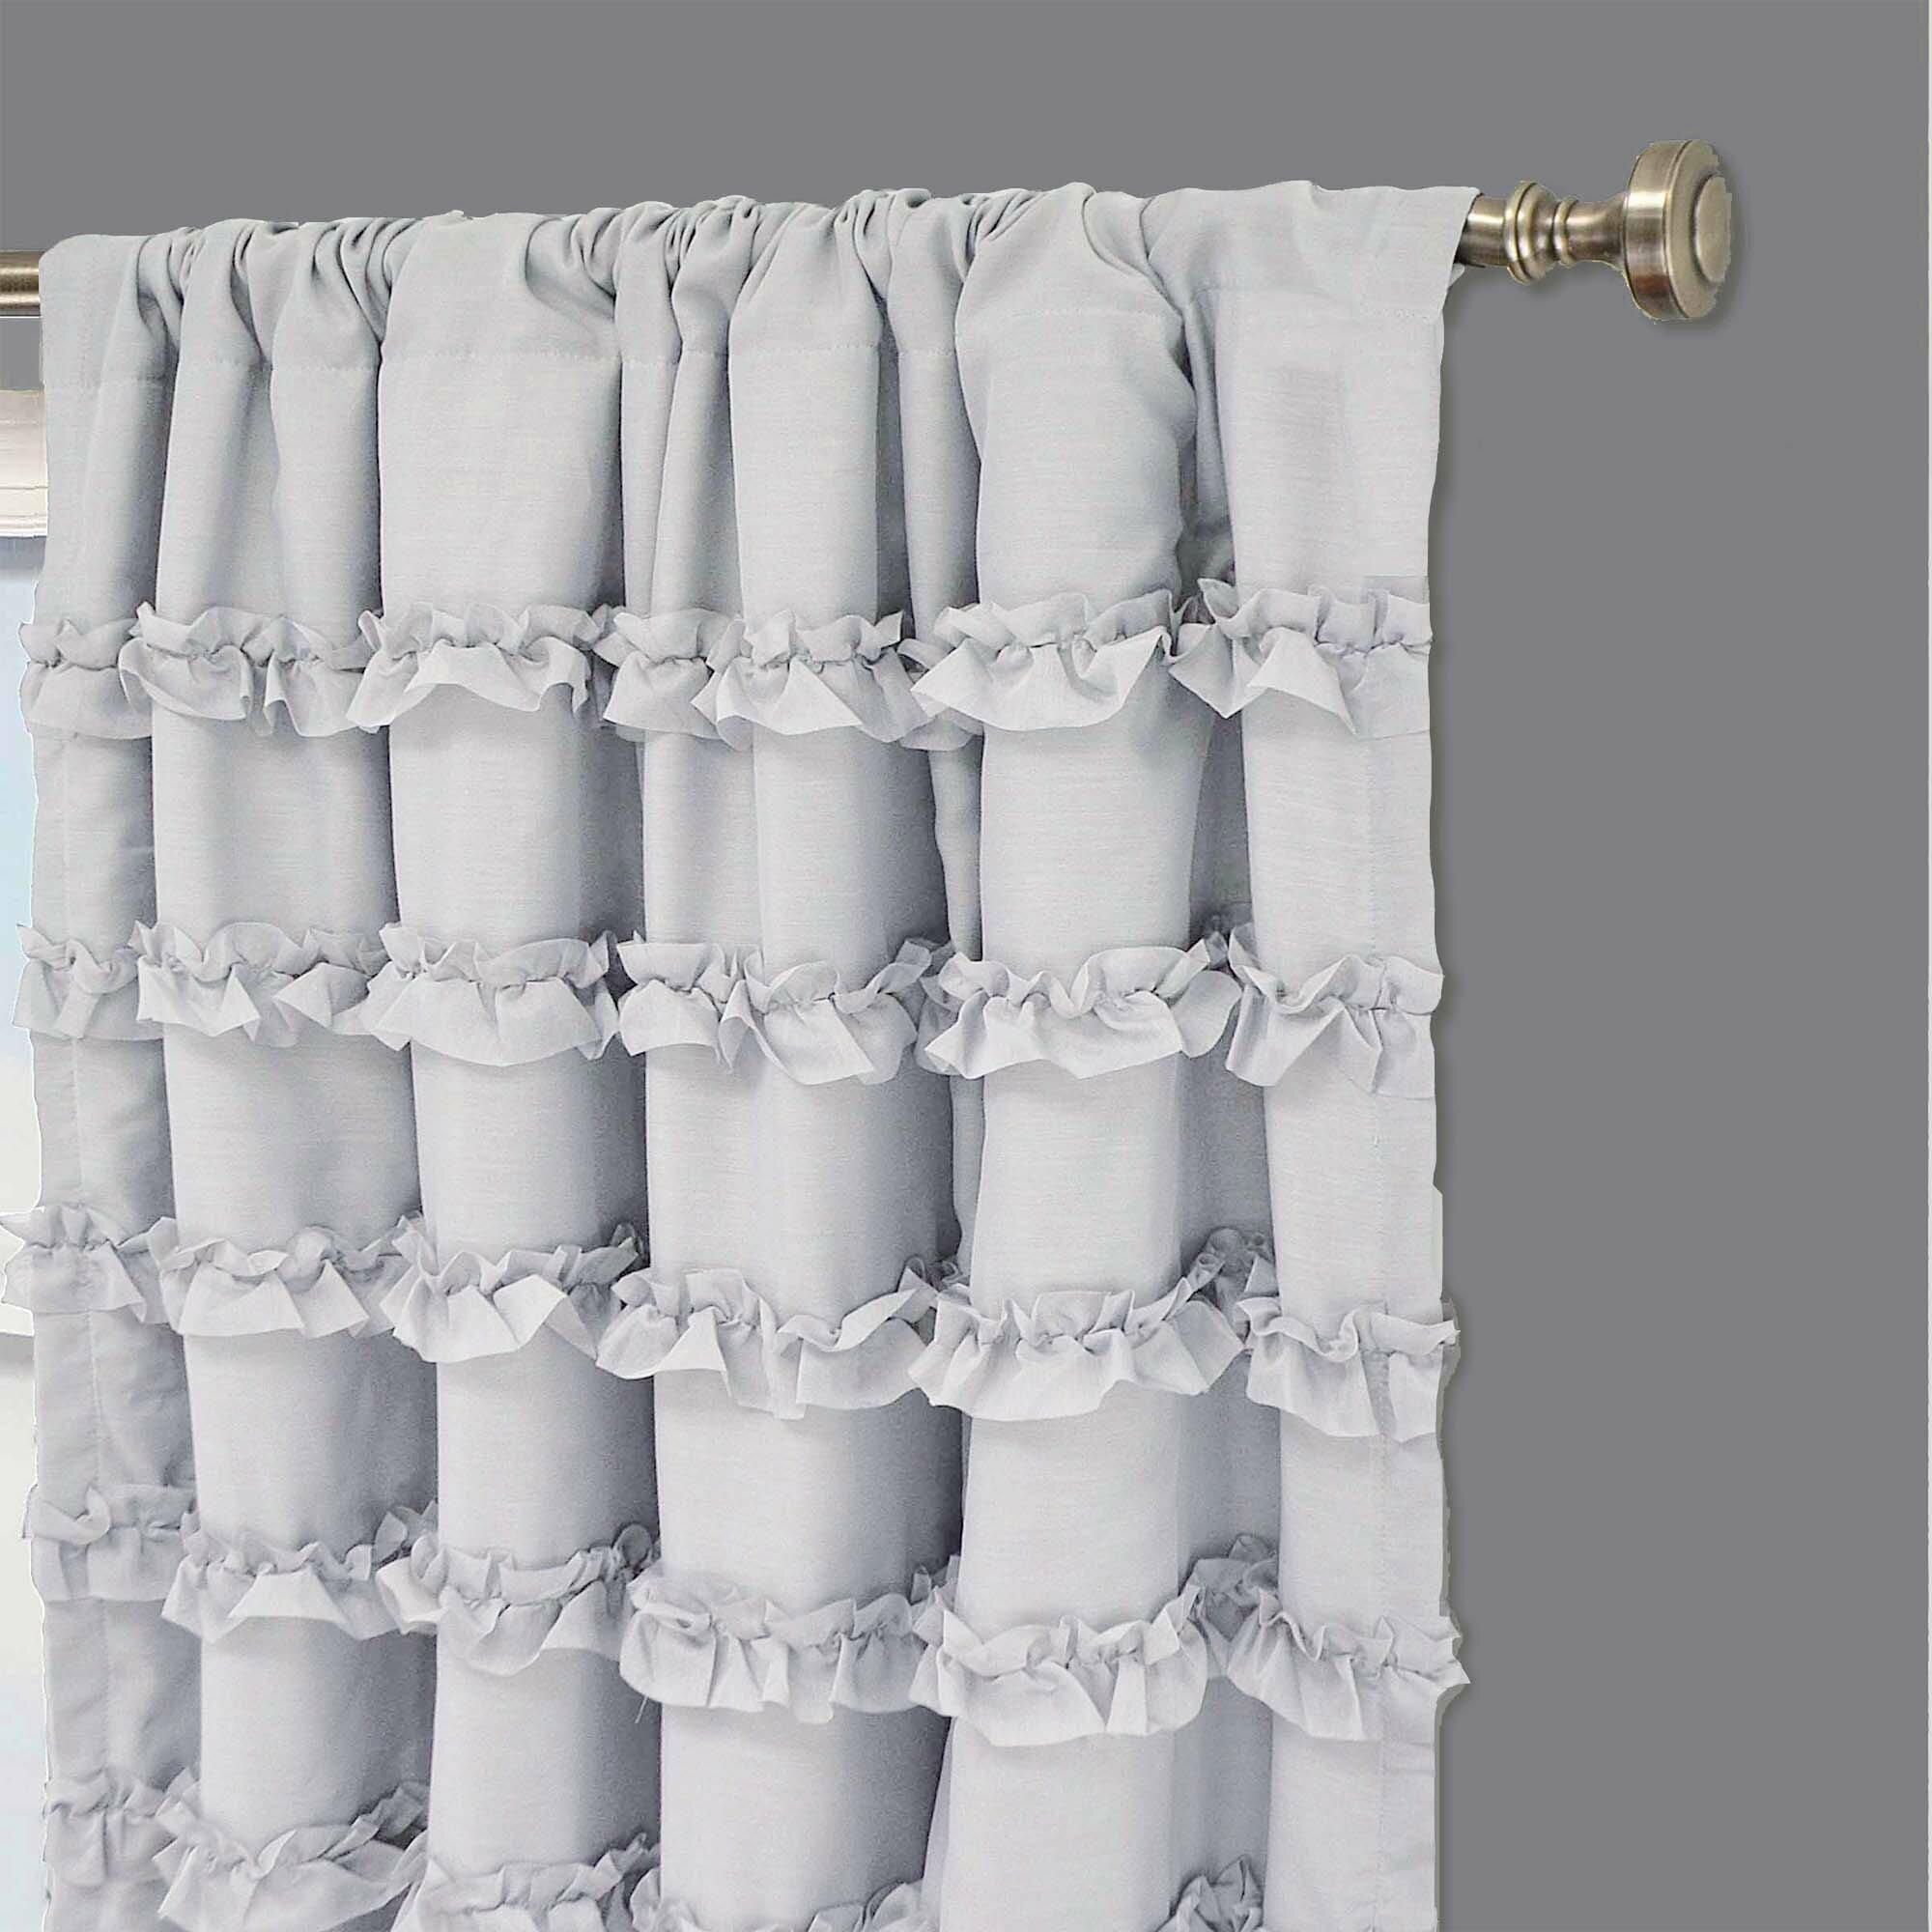 Ruffle curtains - Viv Rae Rayna Ruffle Blackout Single Curtain Panel